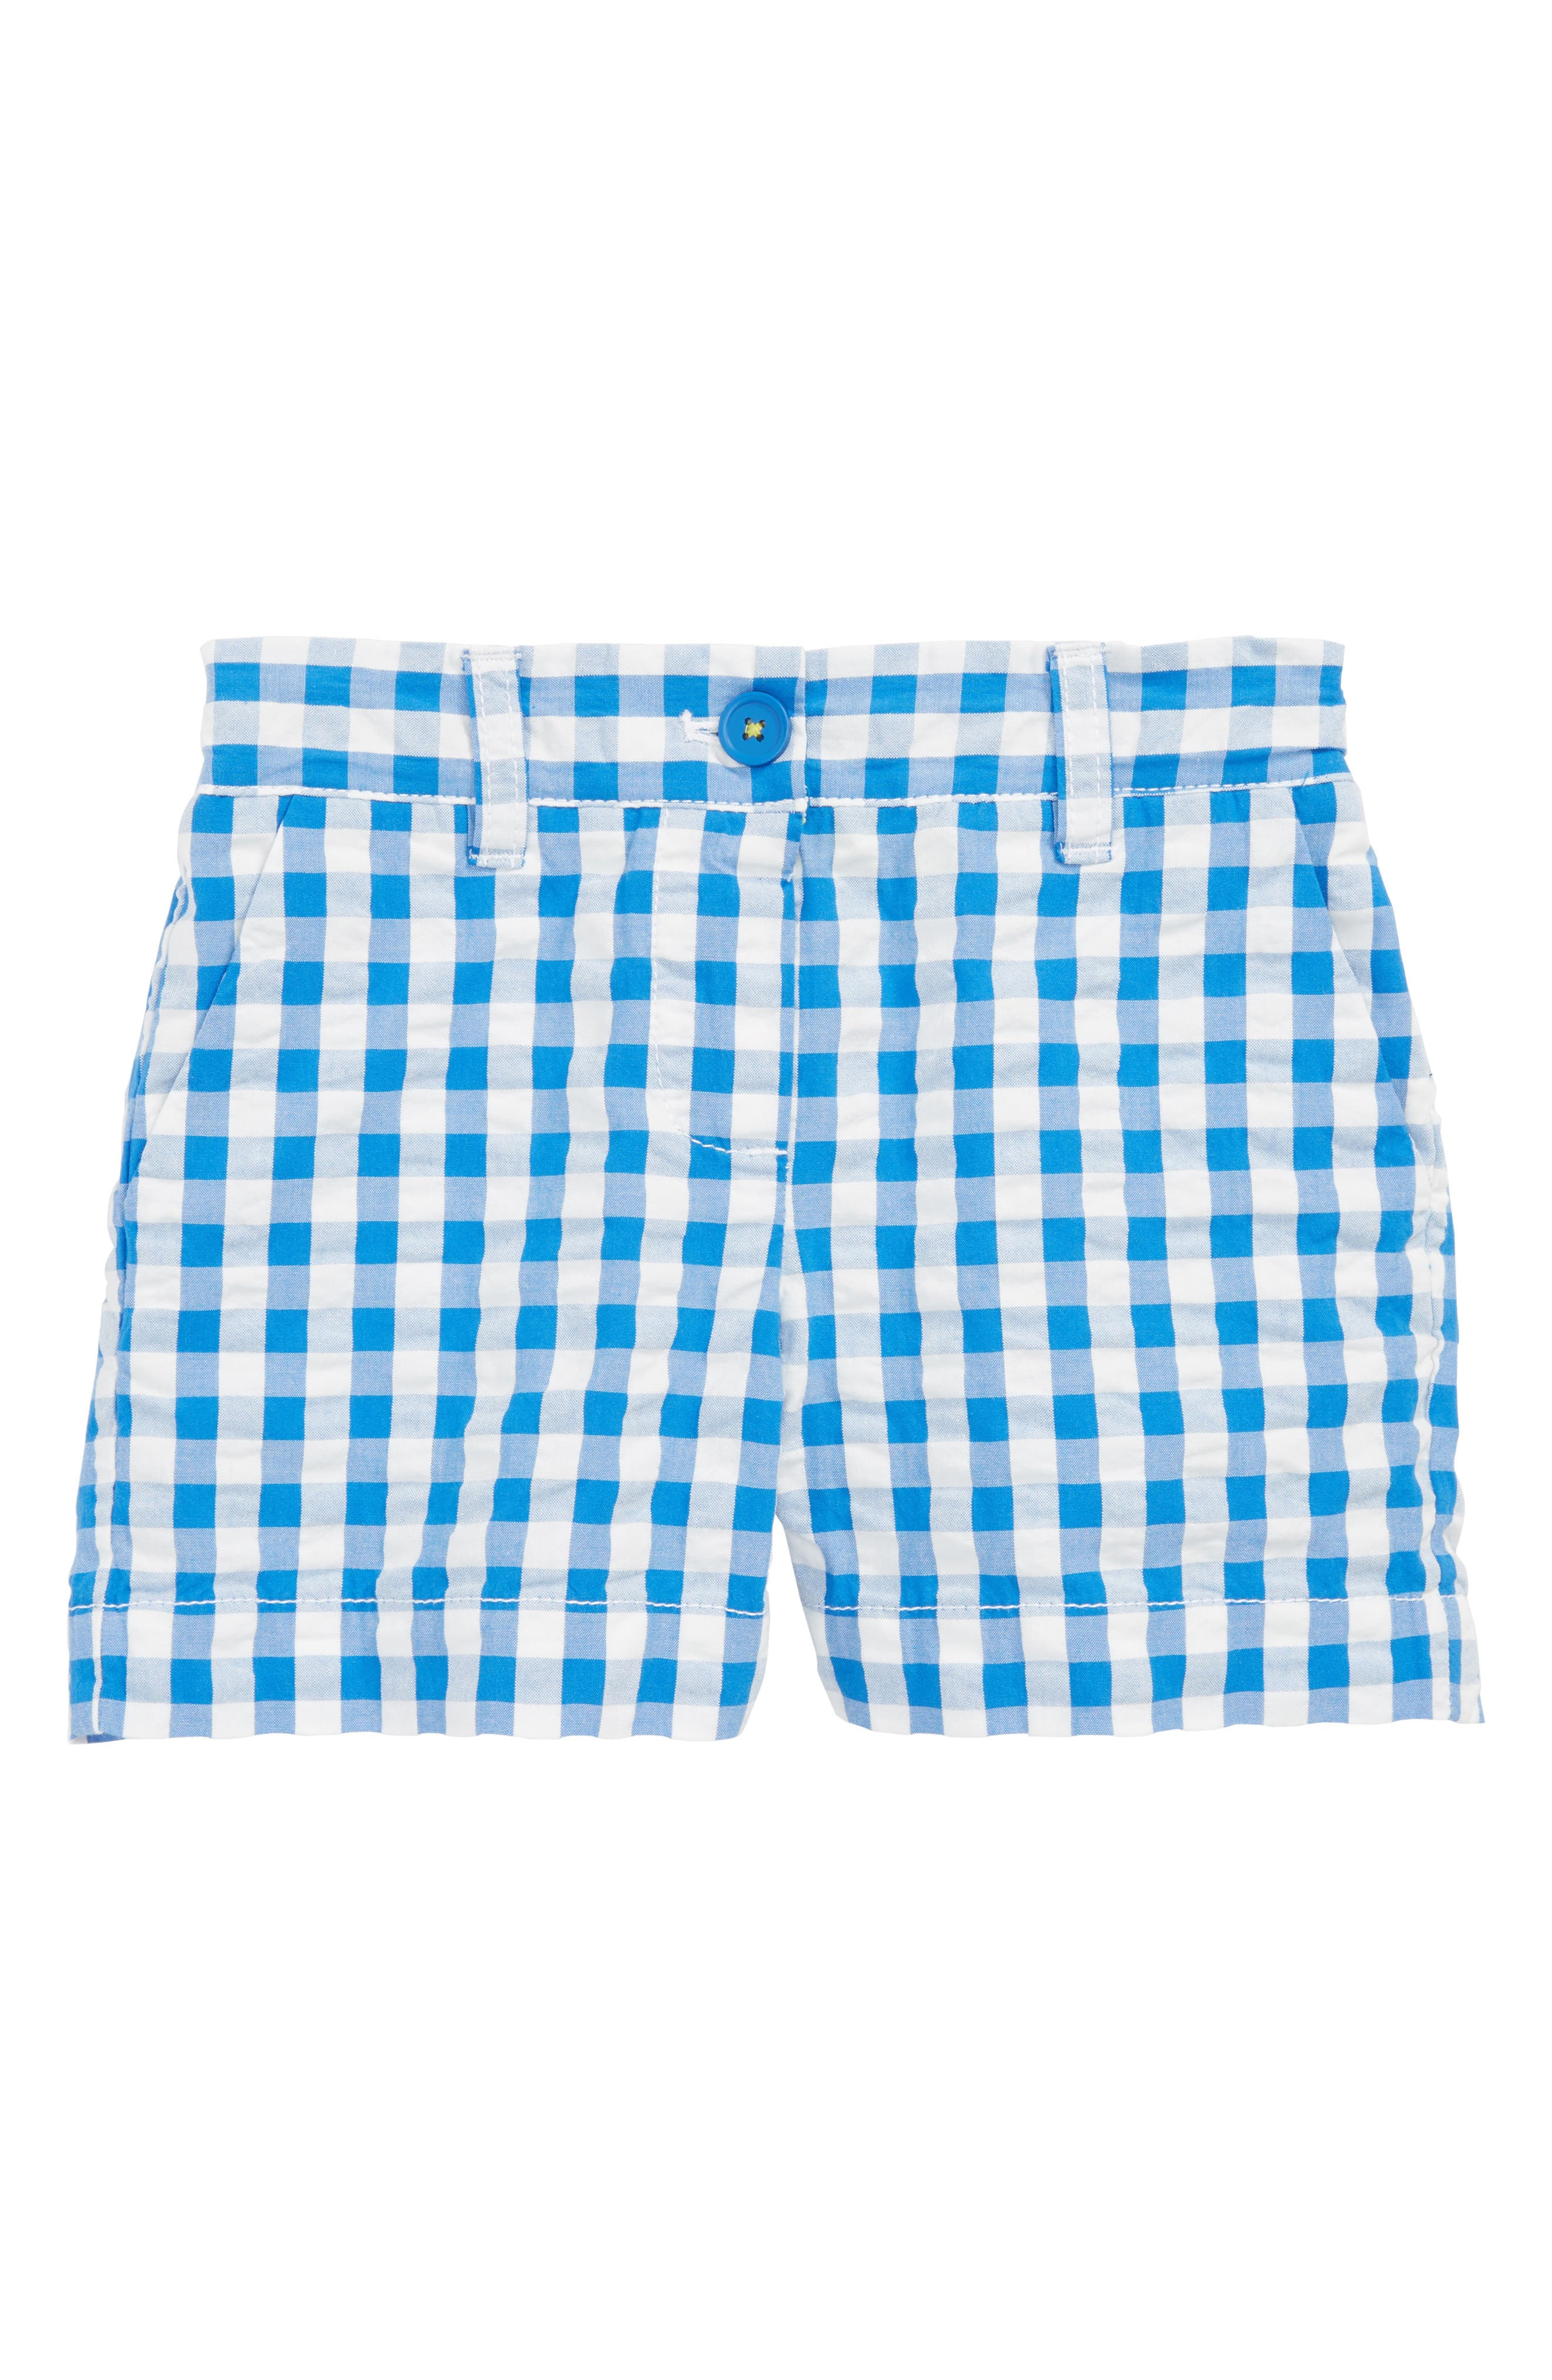 Bright Adventure Shorts,                         Main,                         color, Skipper Blue Gingham Blu